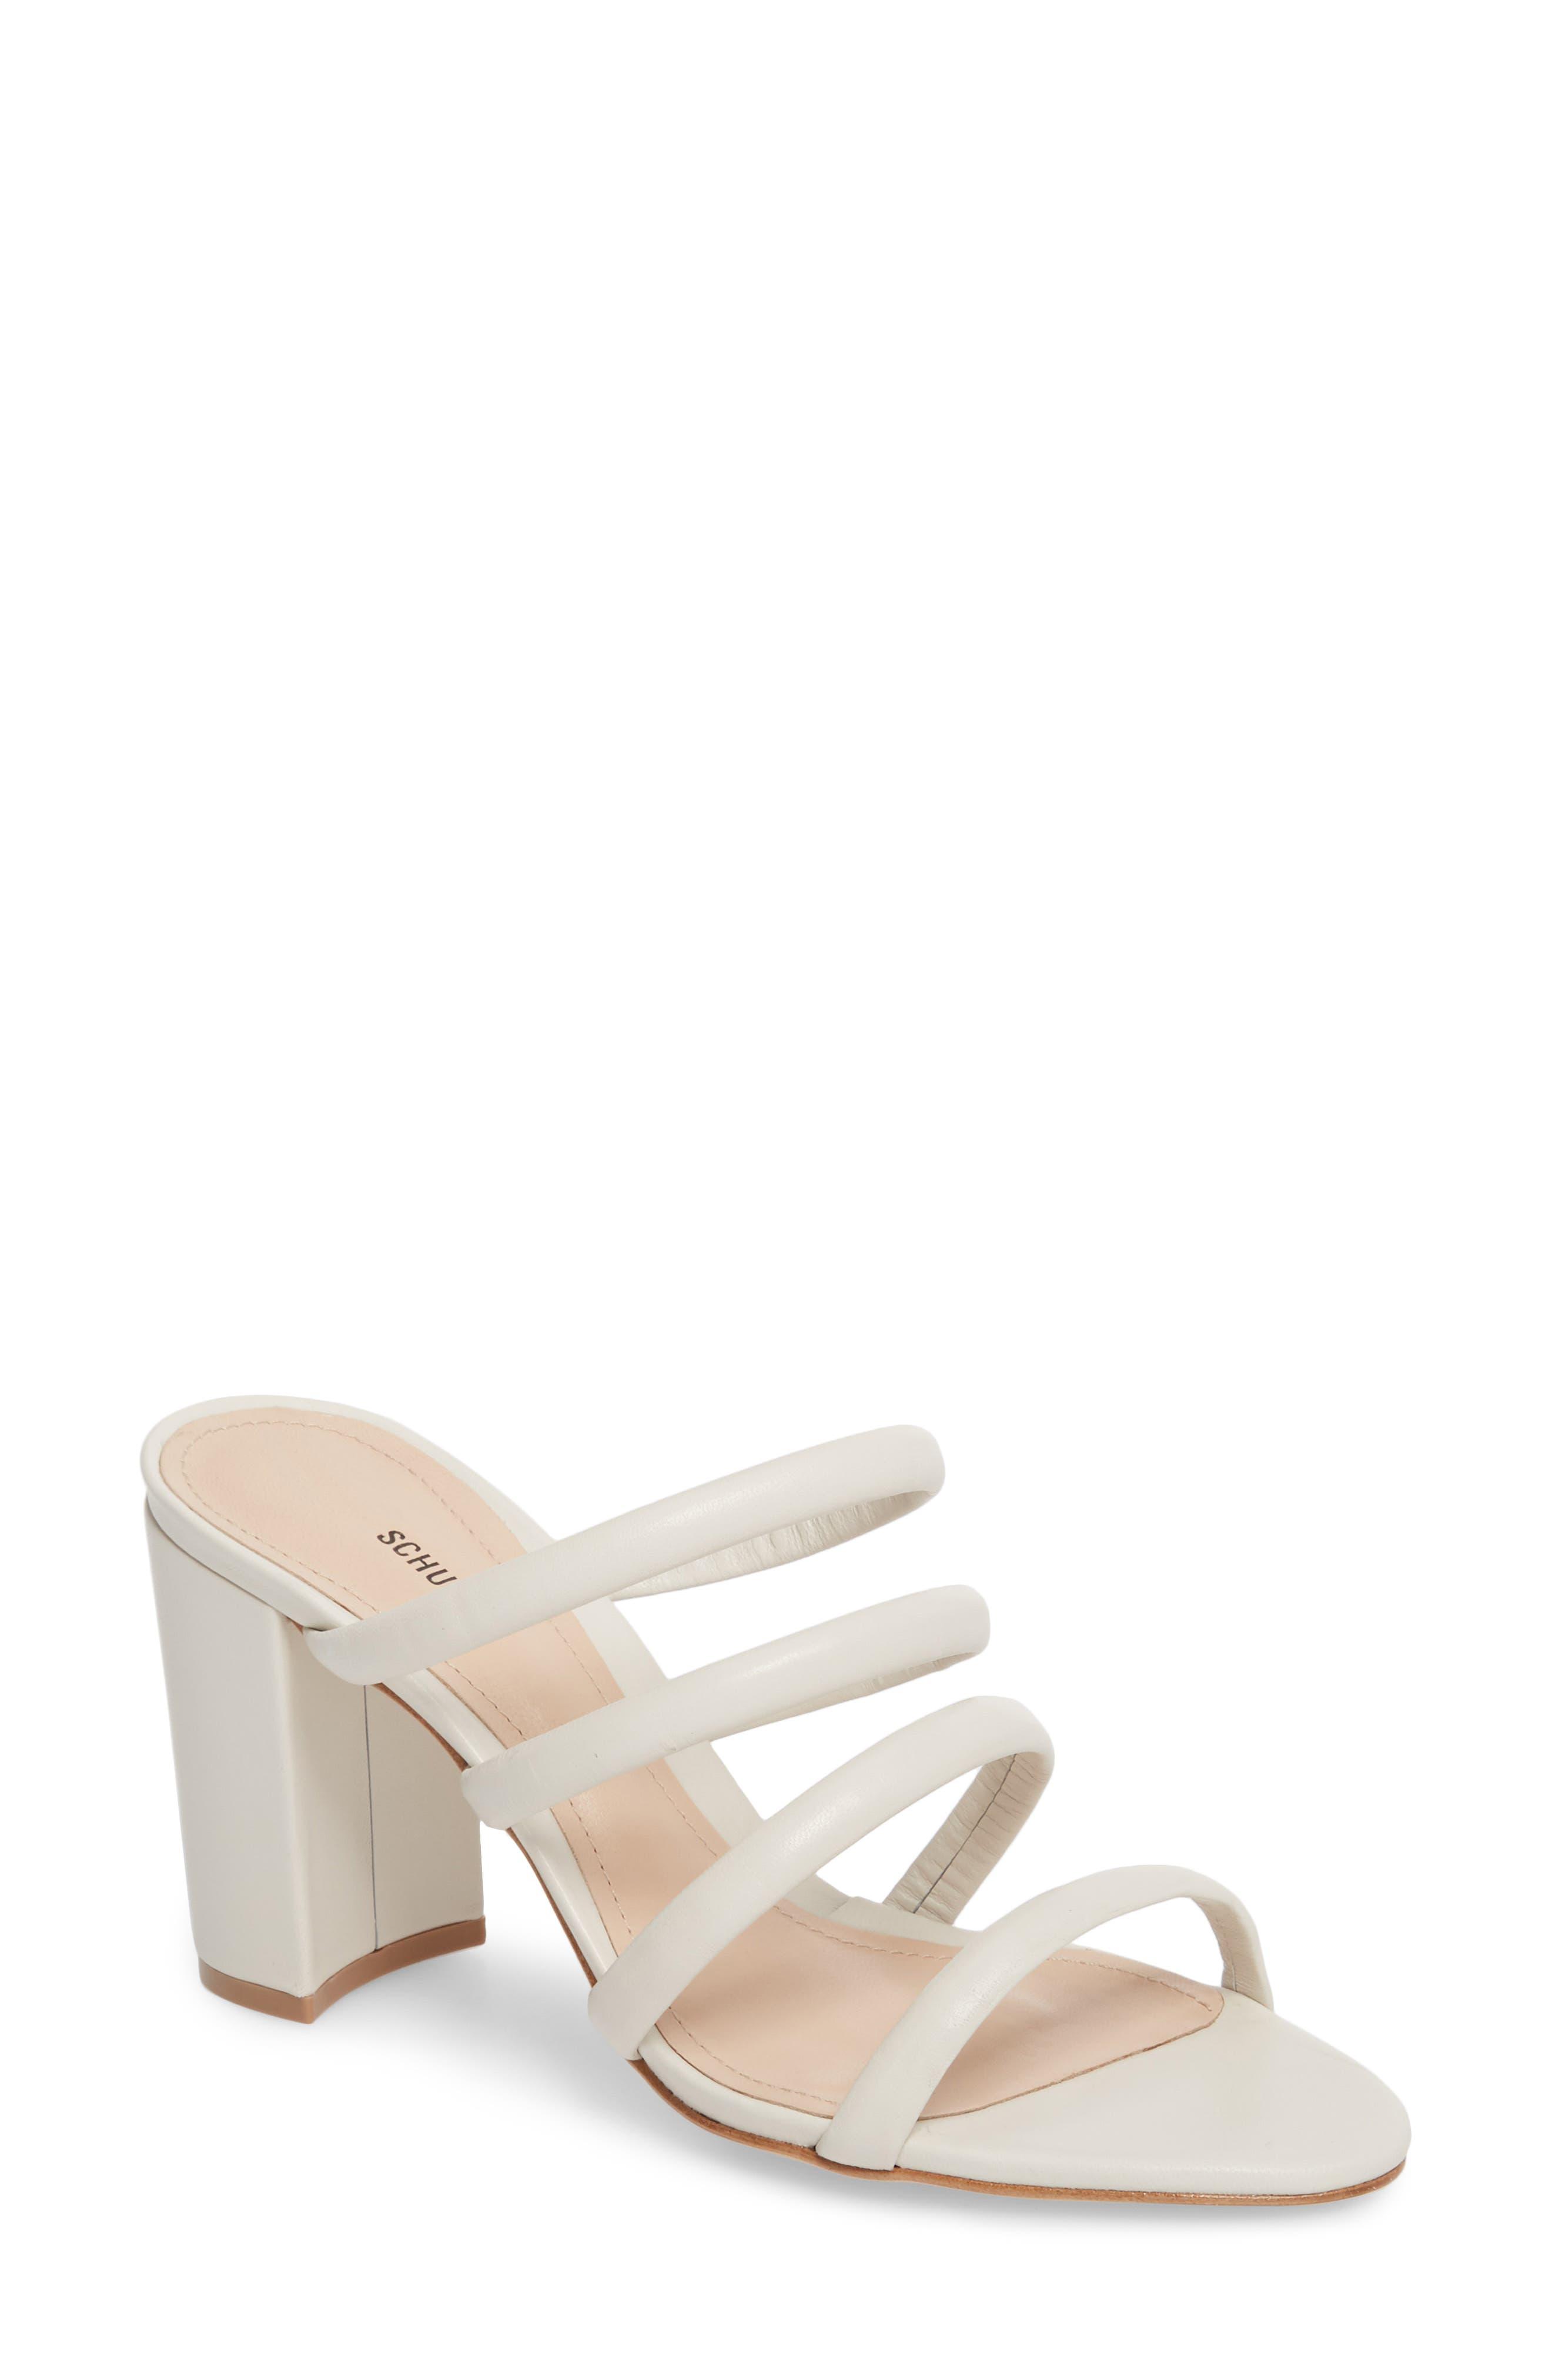 Felisa Block Heel Sandal,                             Main thumbnail 1, color,                             100